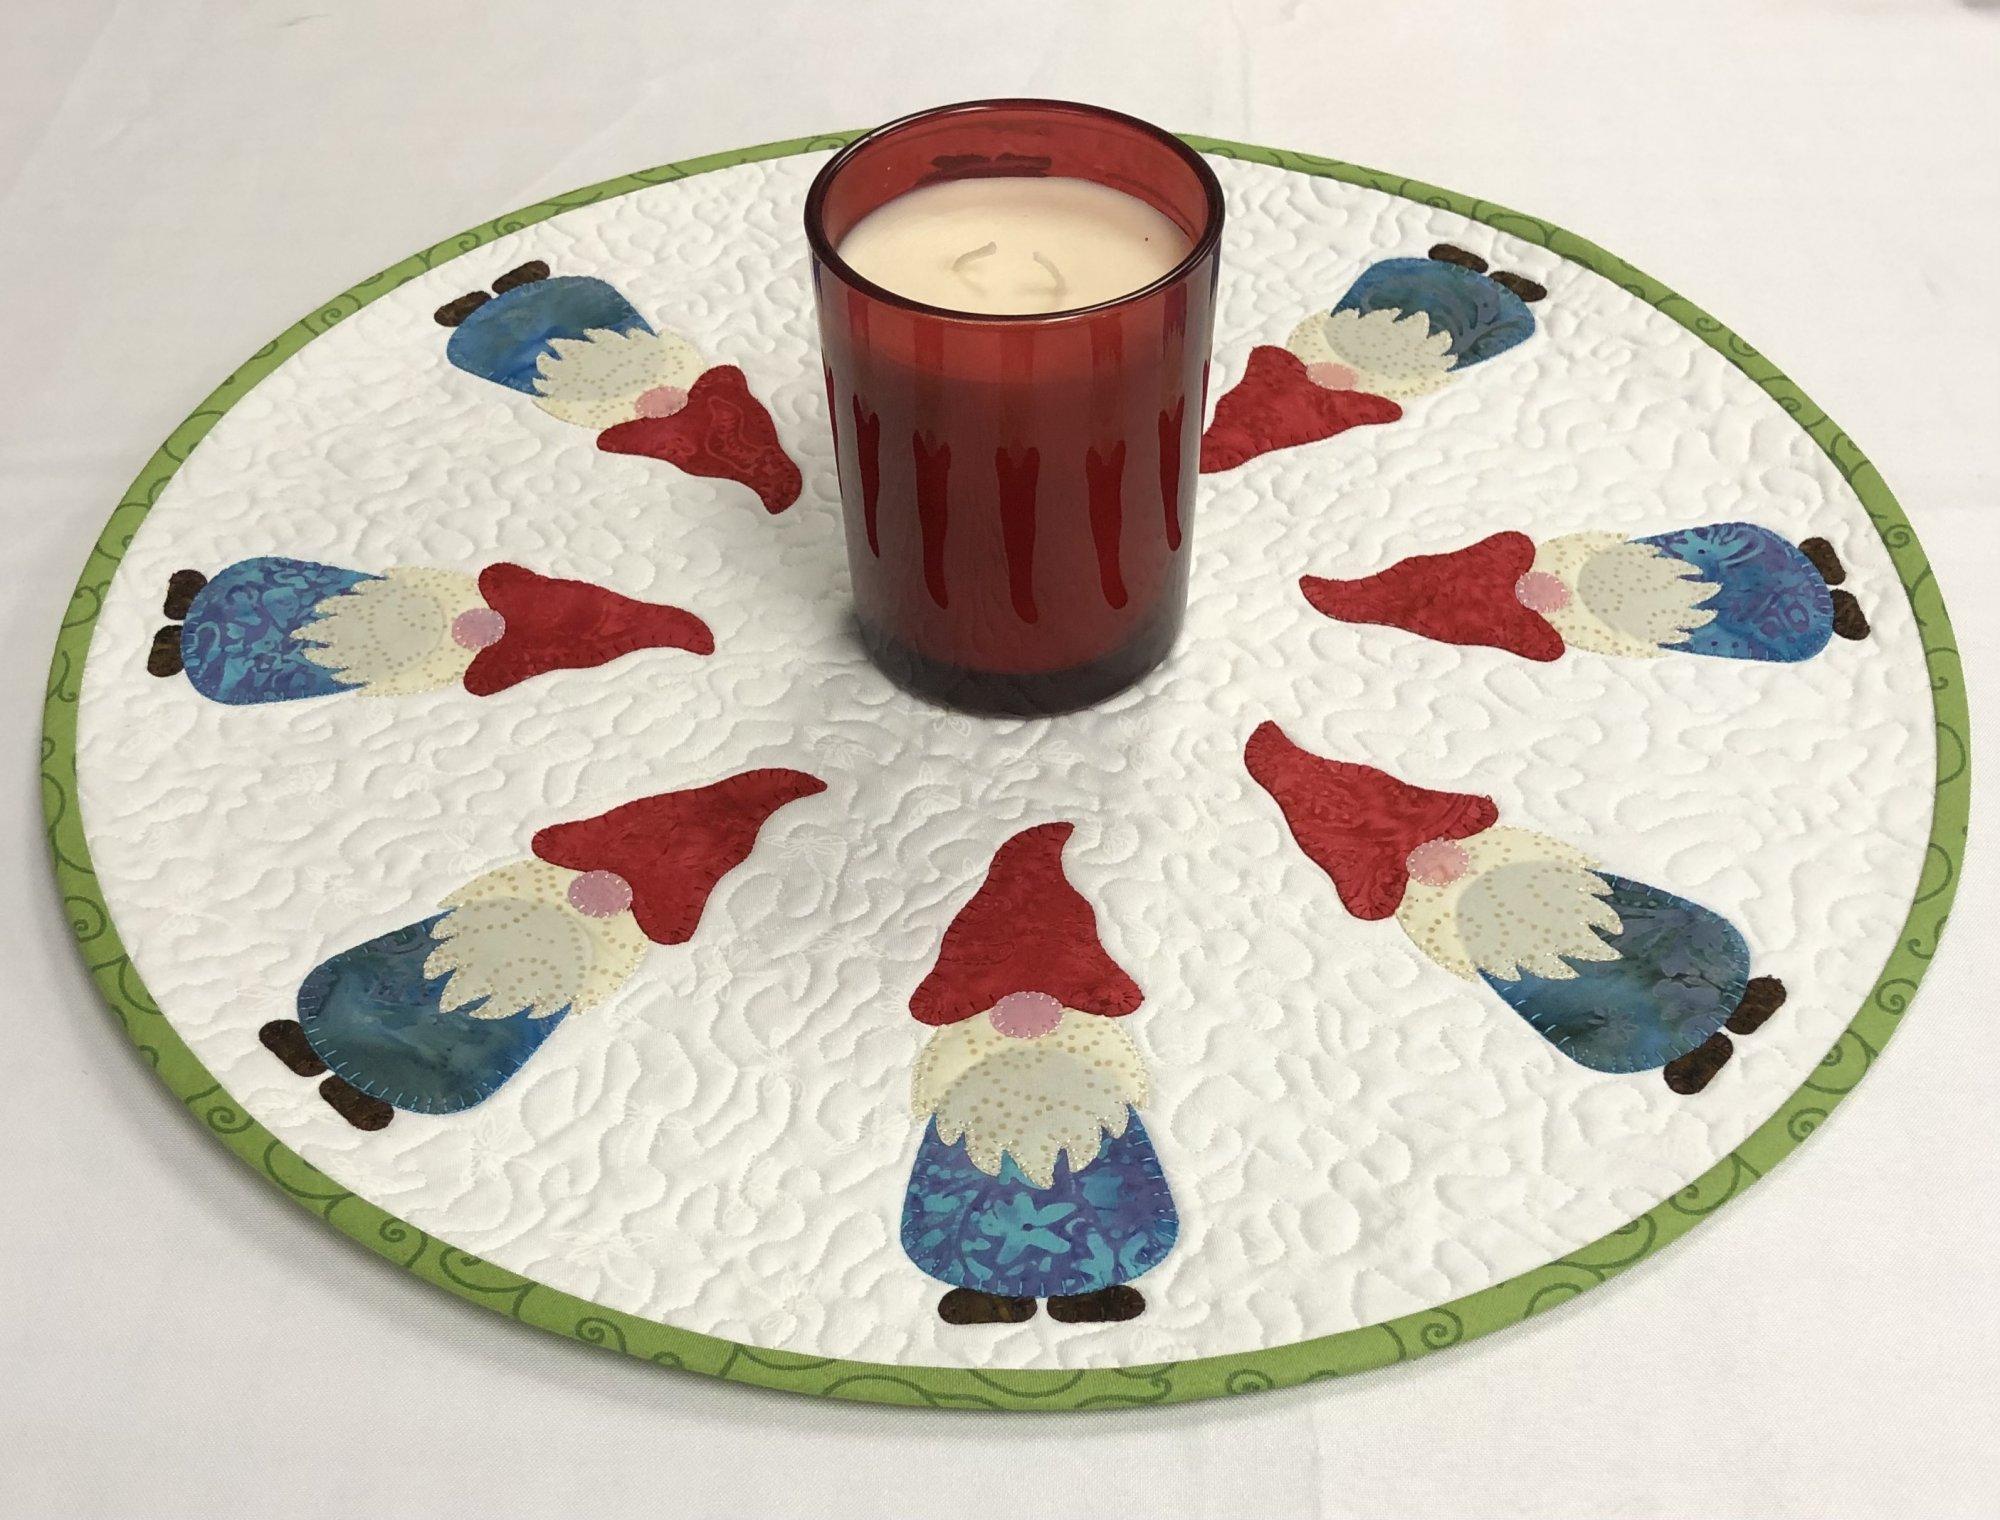 Wish Table Topper - Gnomes, Bonus design